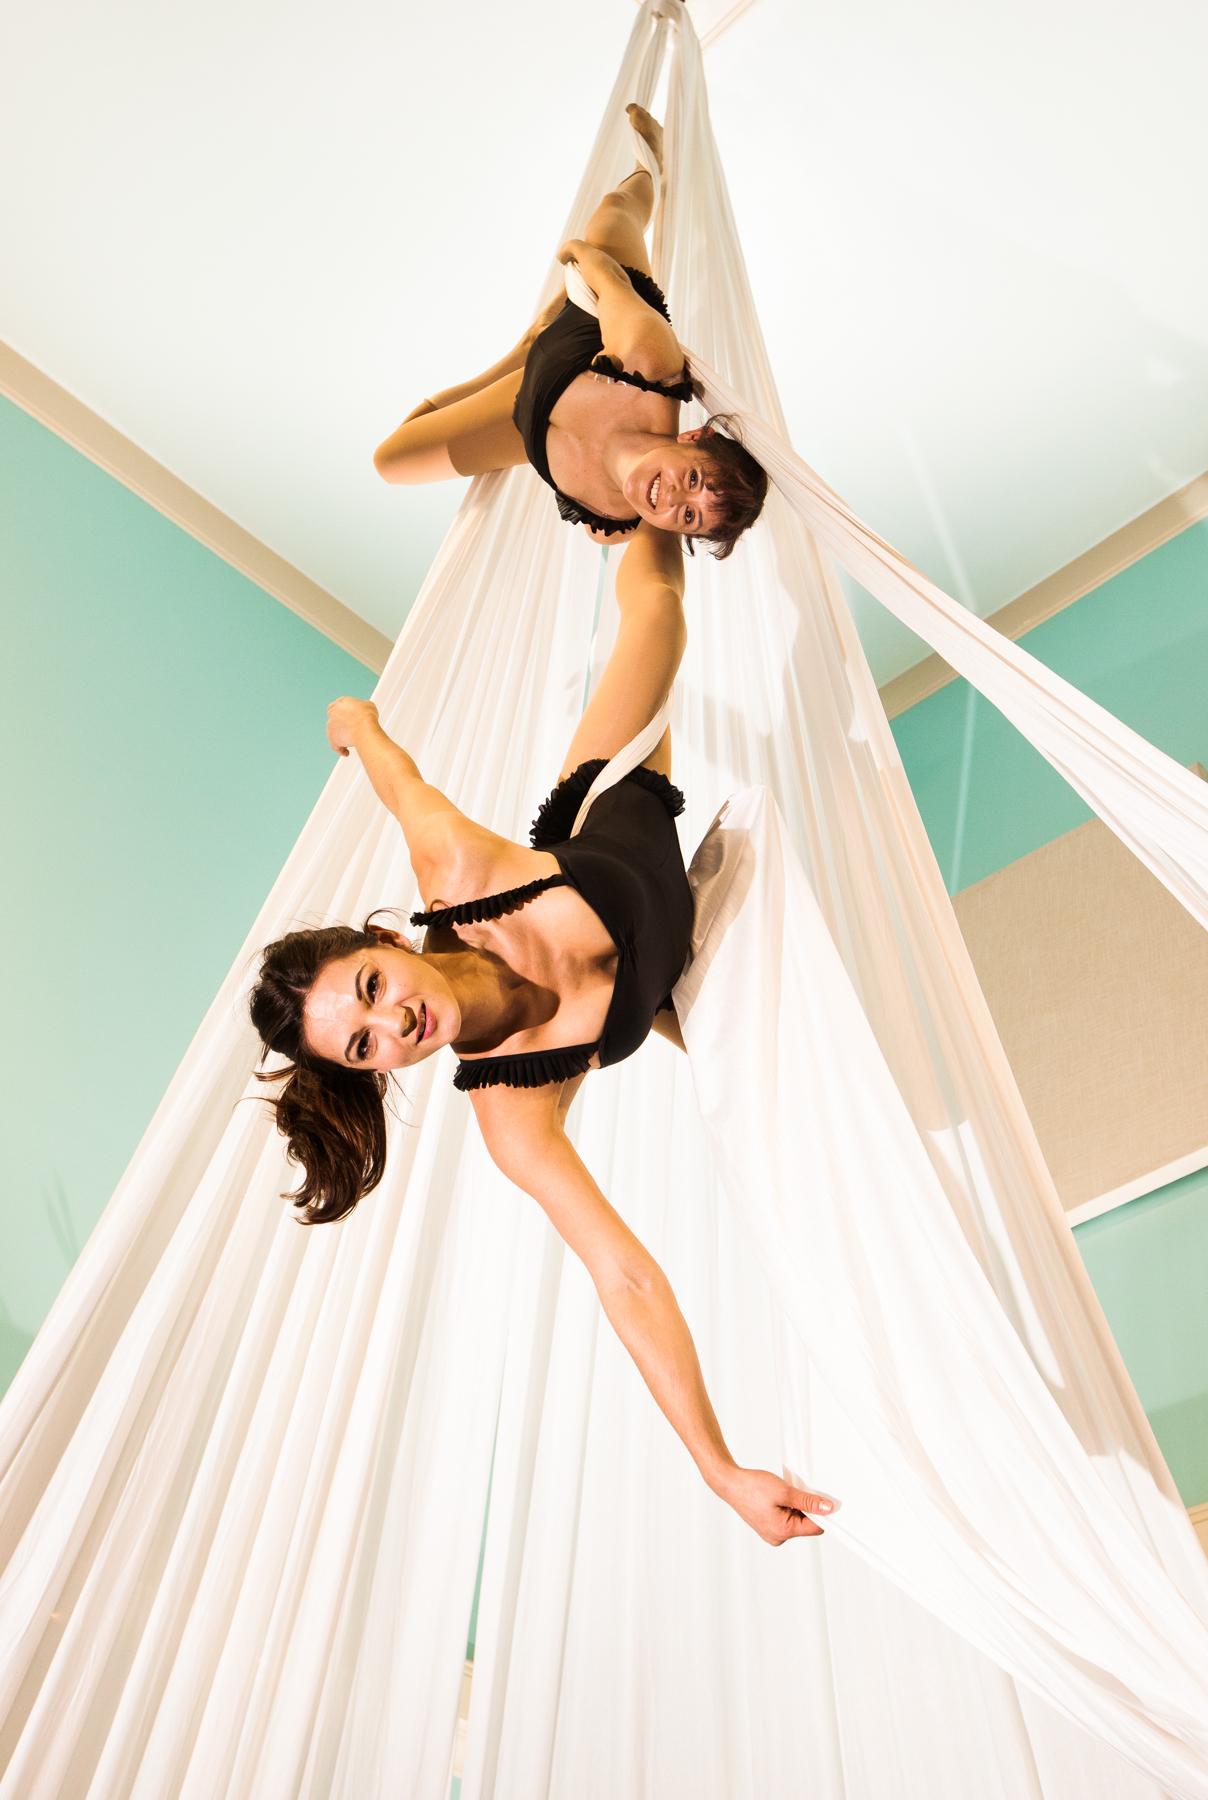 Upbeat Aerial Silks Duo